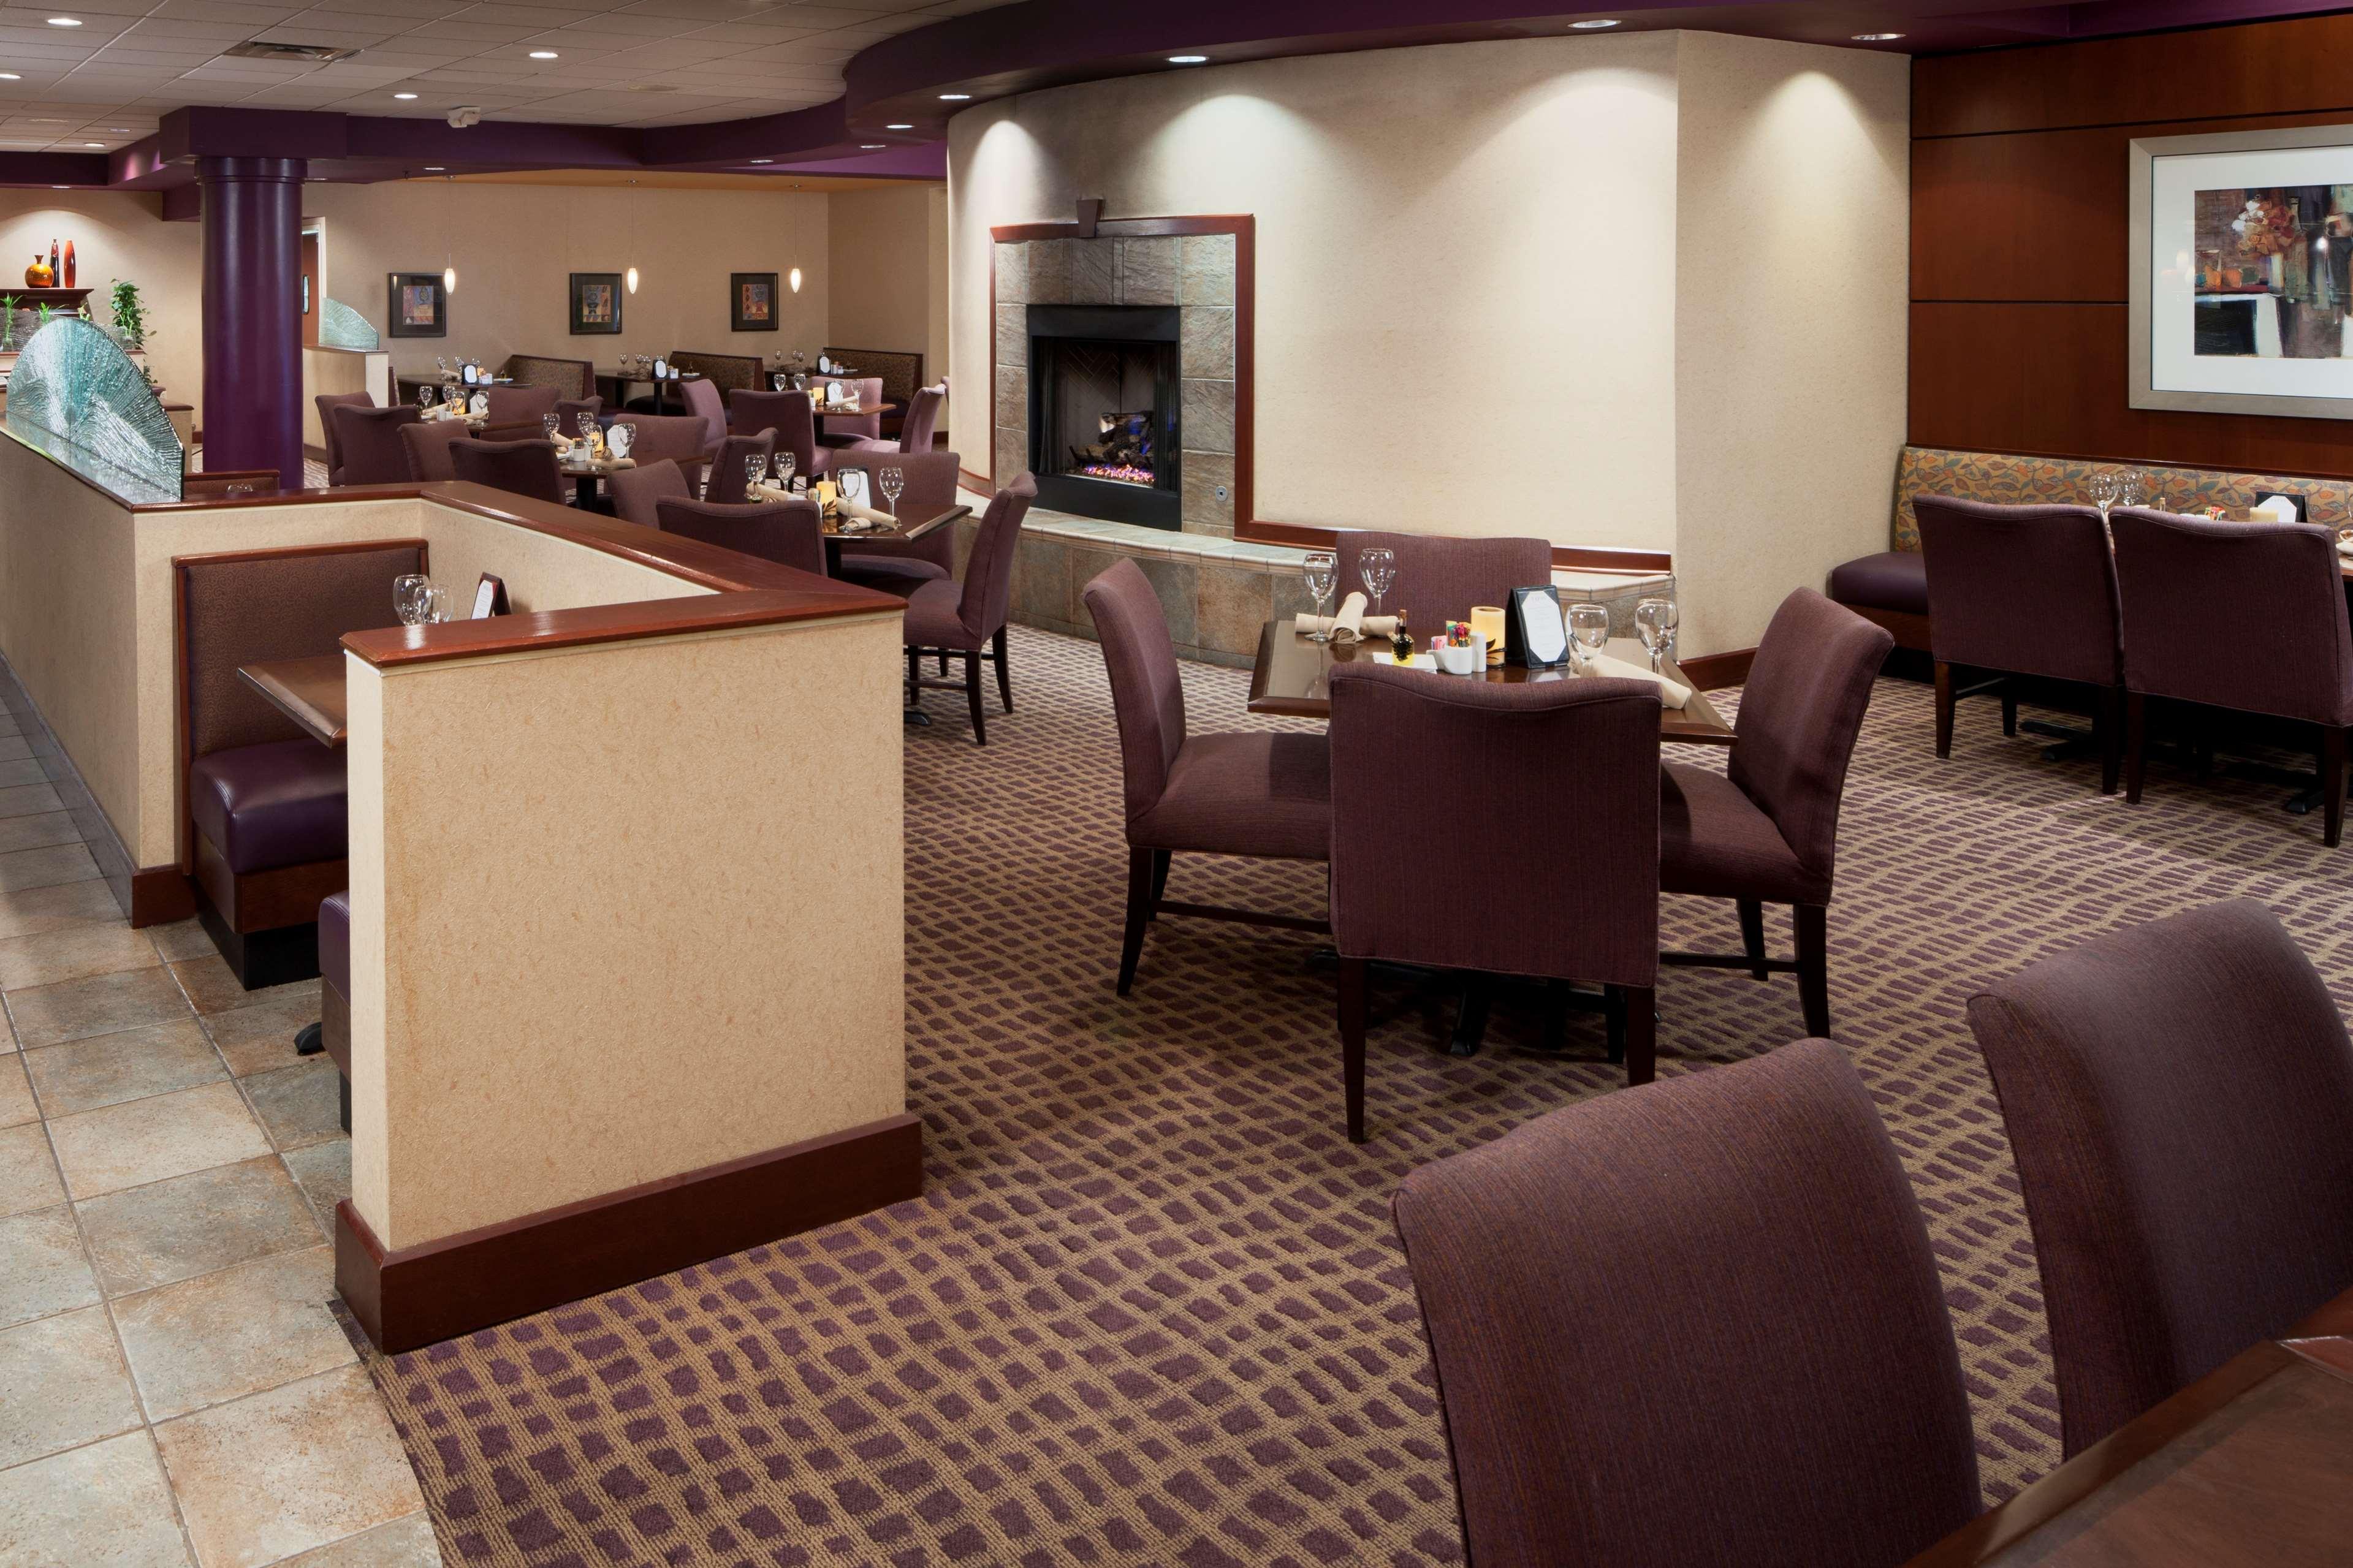 DoubleTree Suites by Hilton Hotel Cincinnati - Blue Ash image 3